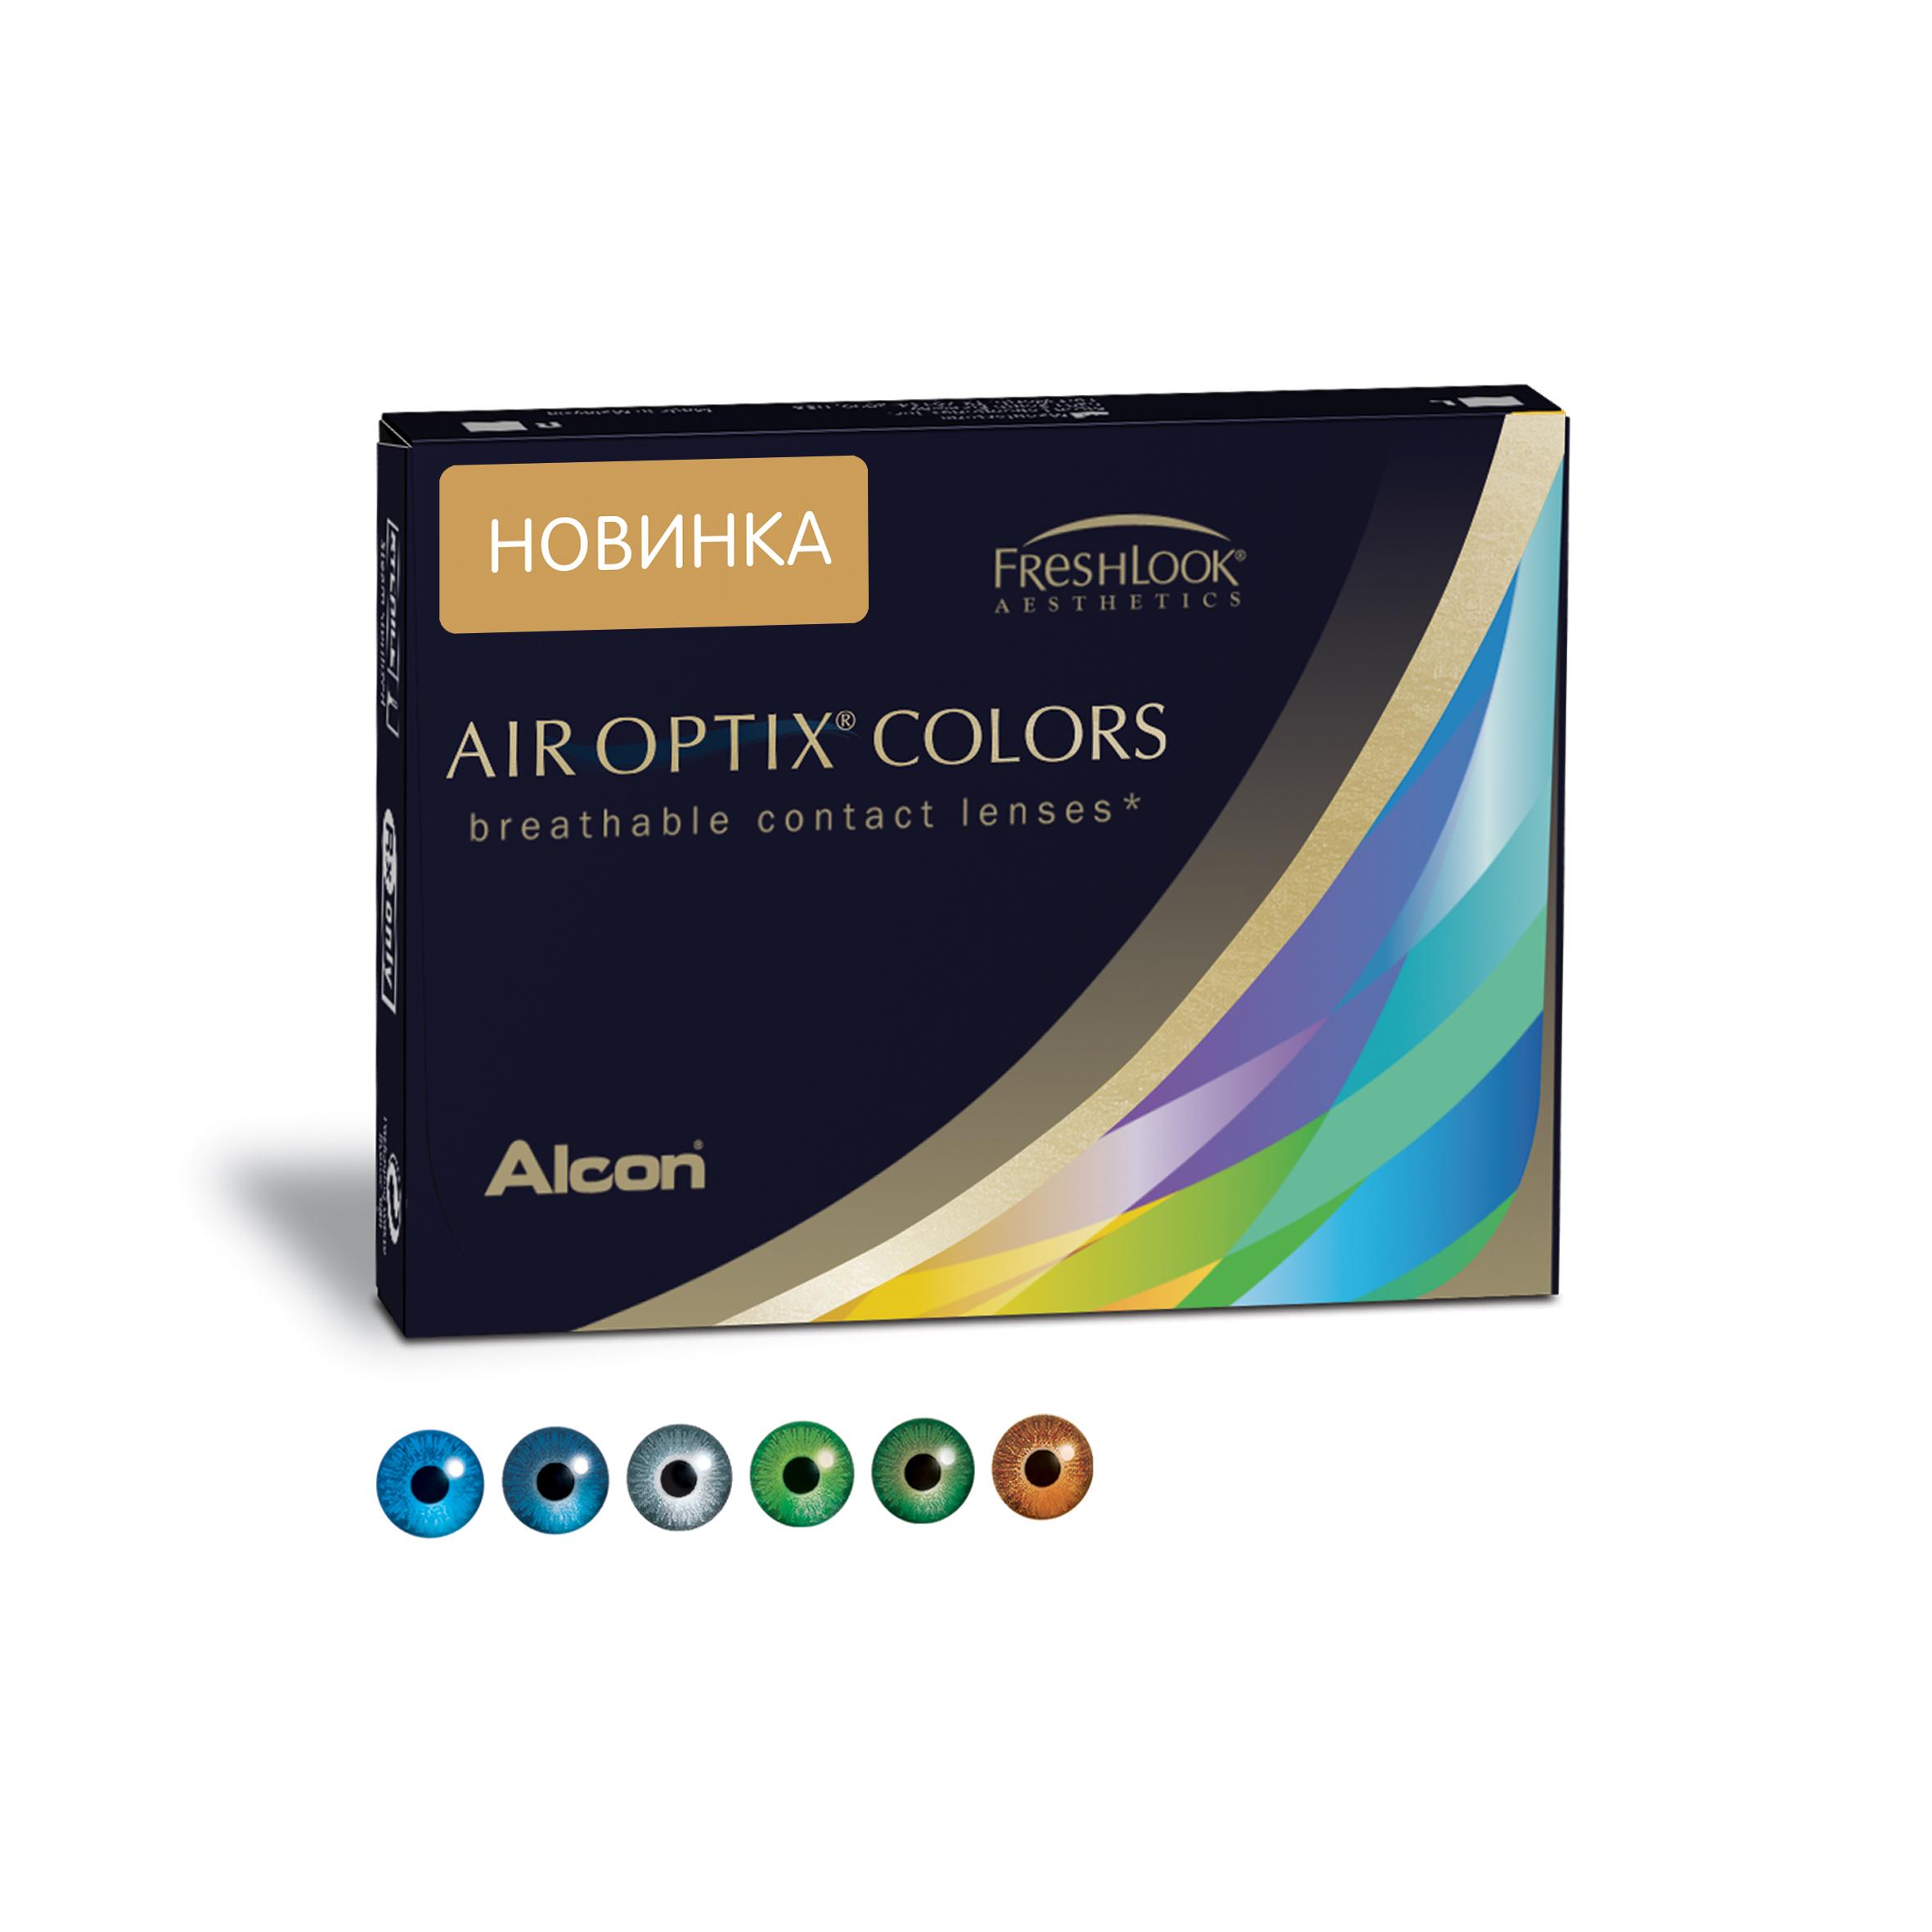 Аlcon контактные линзы Air Optix Colors 2 шт -3.50 Sterling Gray31746219Мягкие контактные линзы